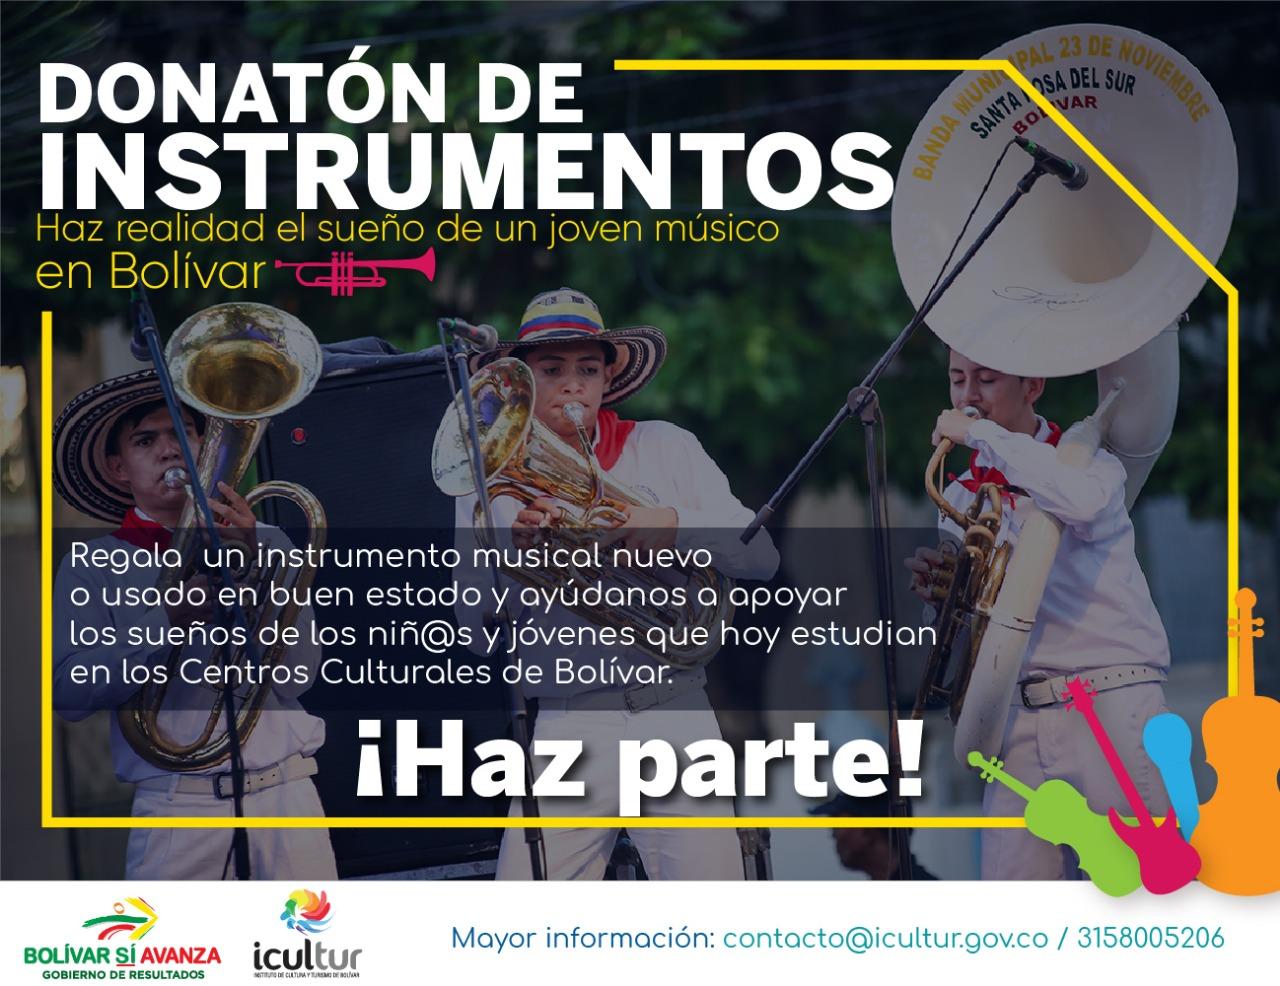 Donatón de instrumentos para músicos de Bolívar será hasta el 15 de noviembre